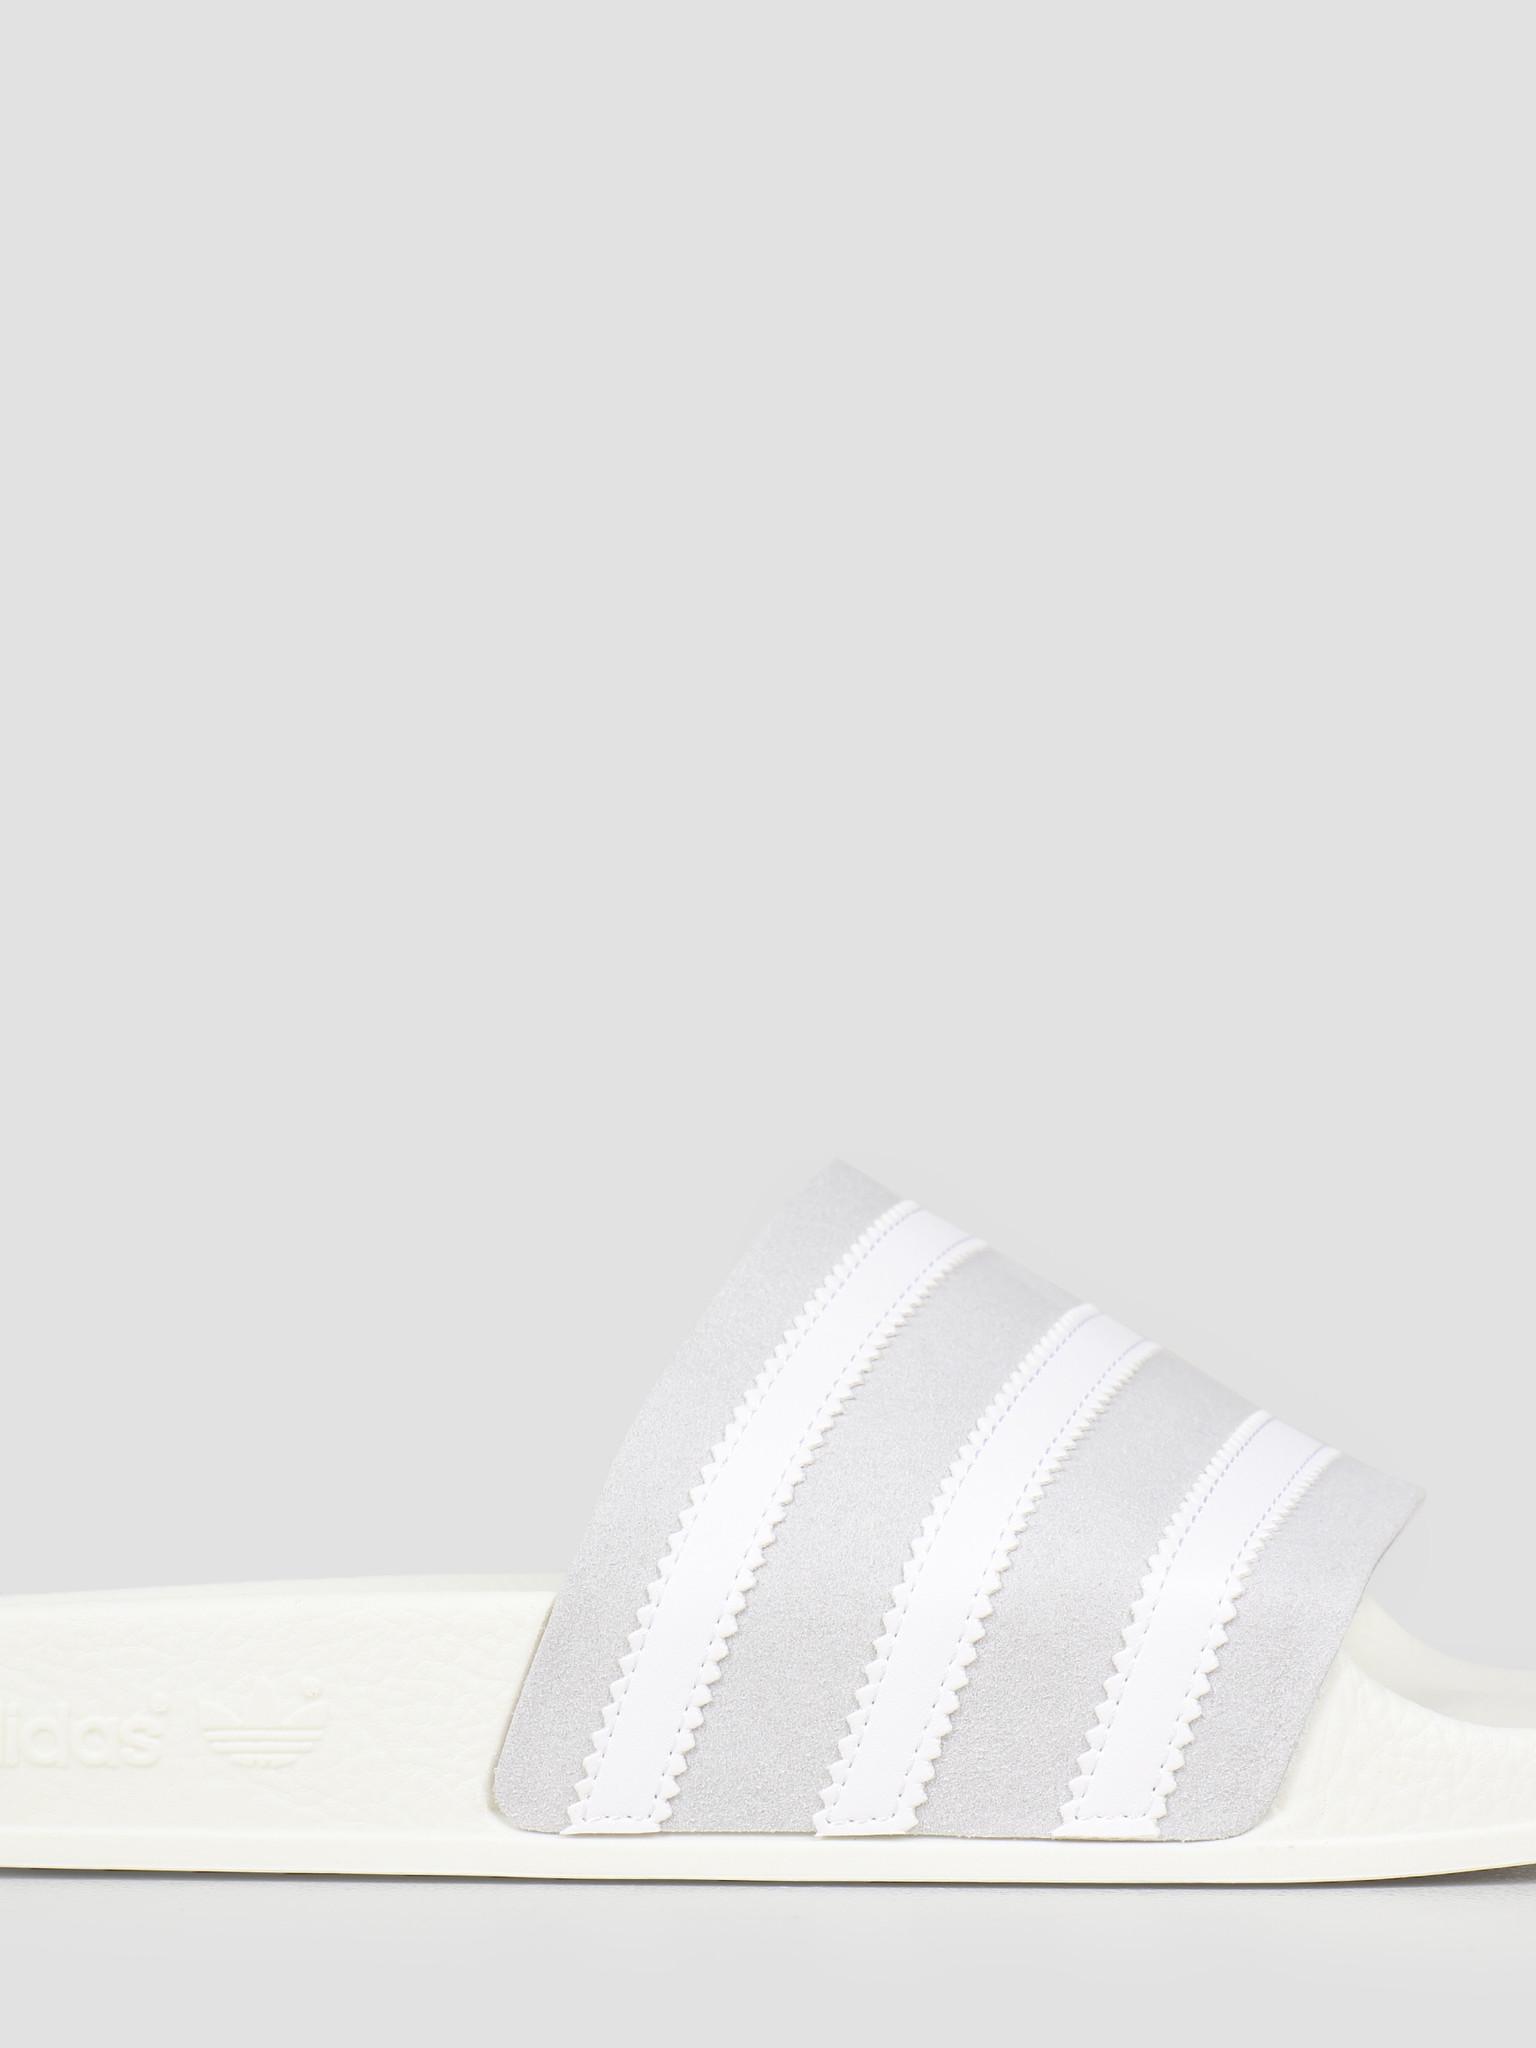 adidas adidas AdileTrack Tope Gretwo Ftwwht Owhite CG6435